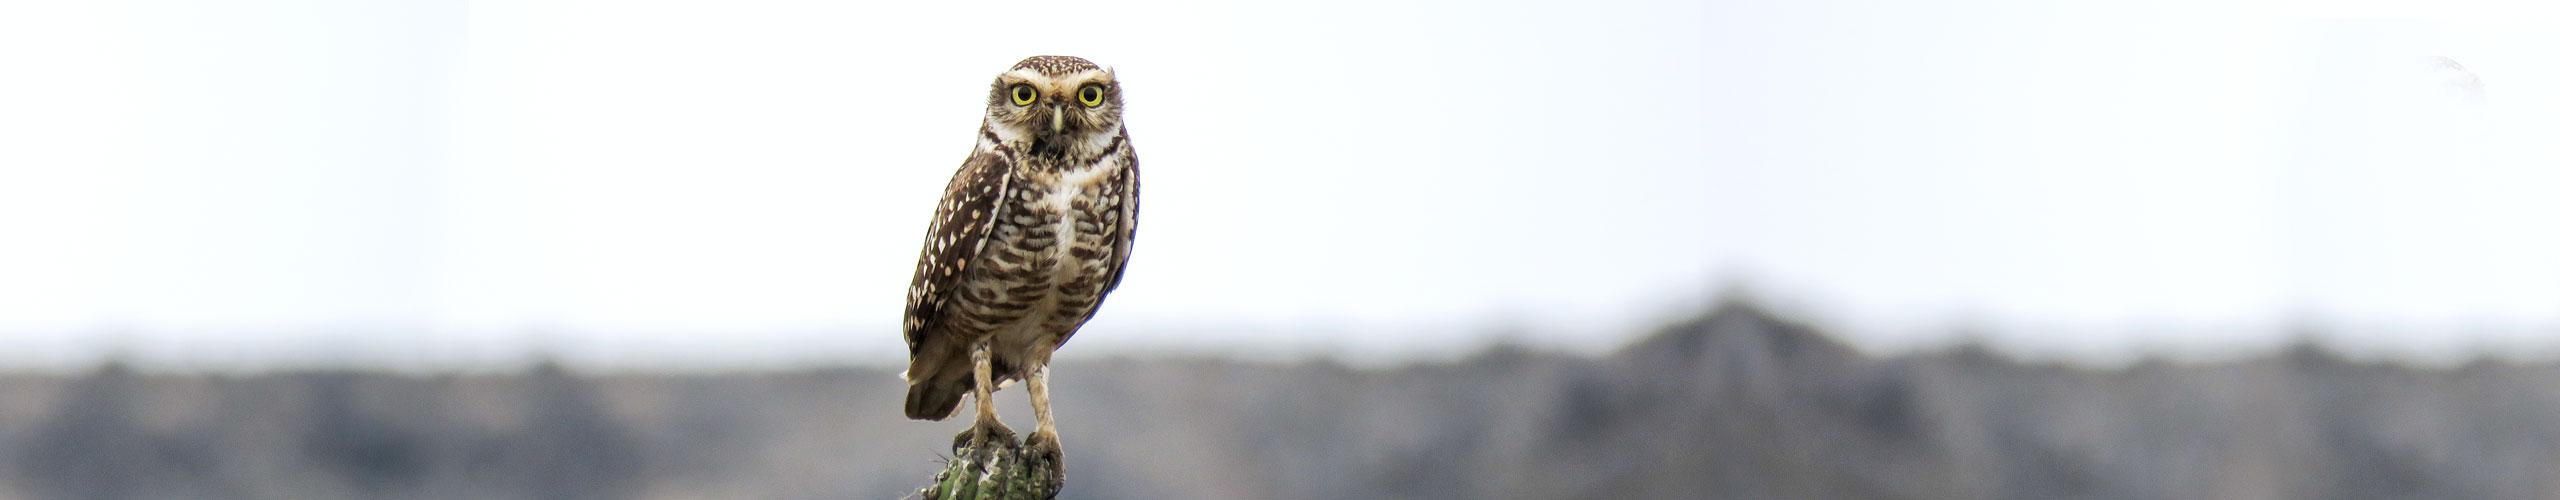 slider-background-chile-burrowing-owl-2